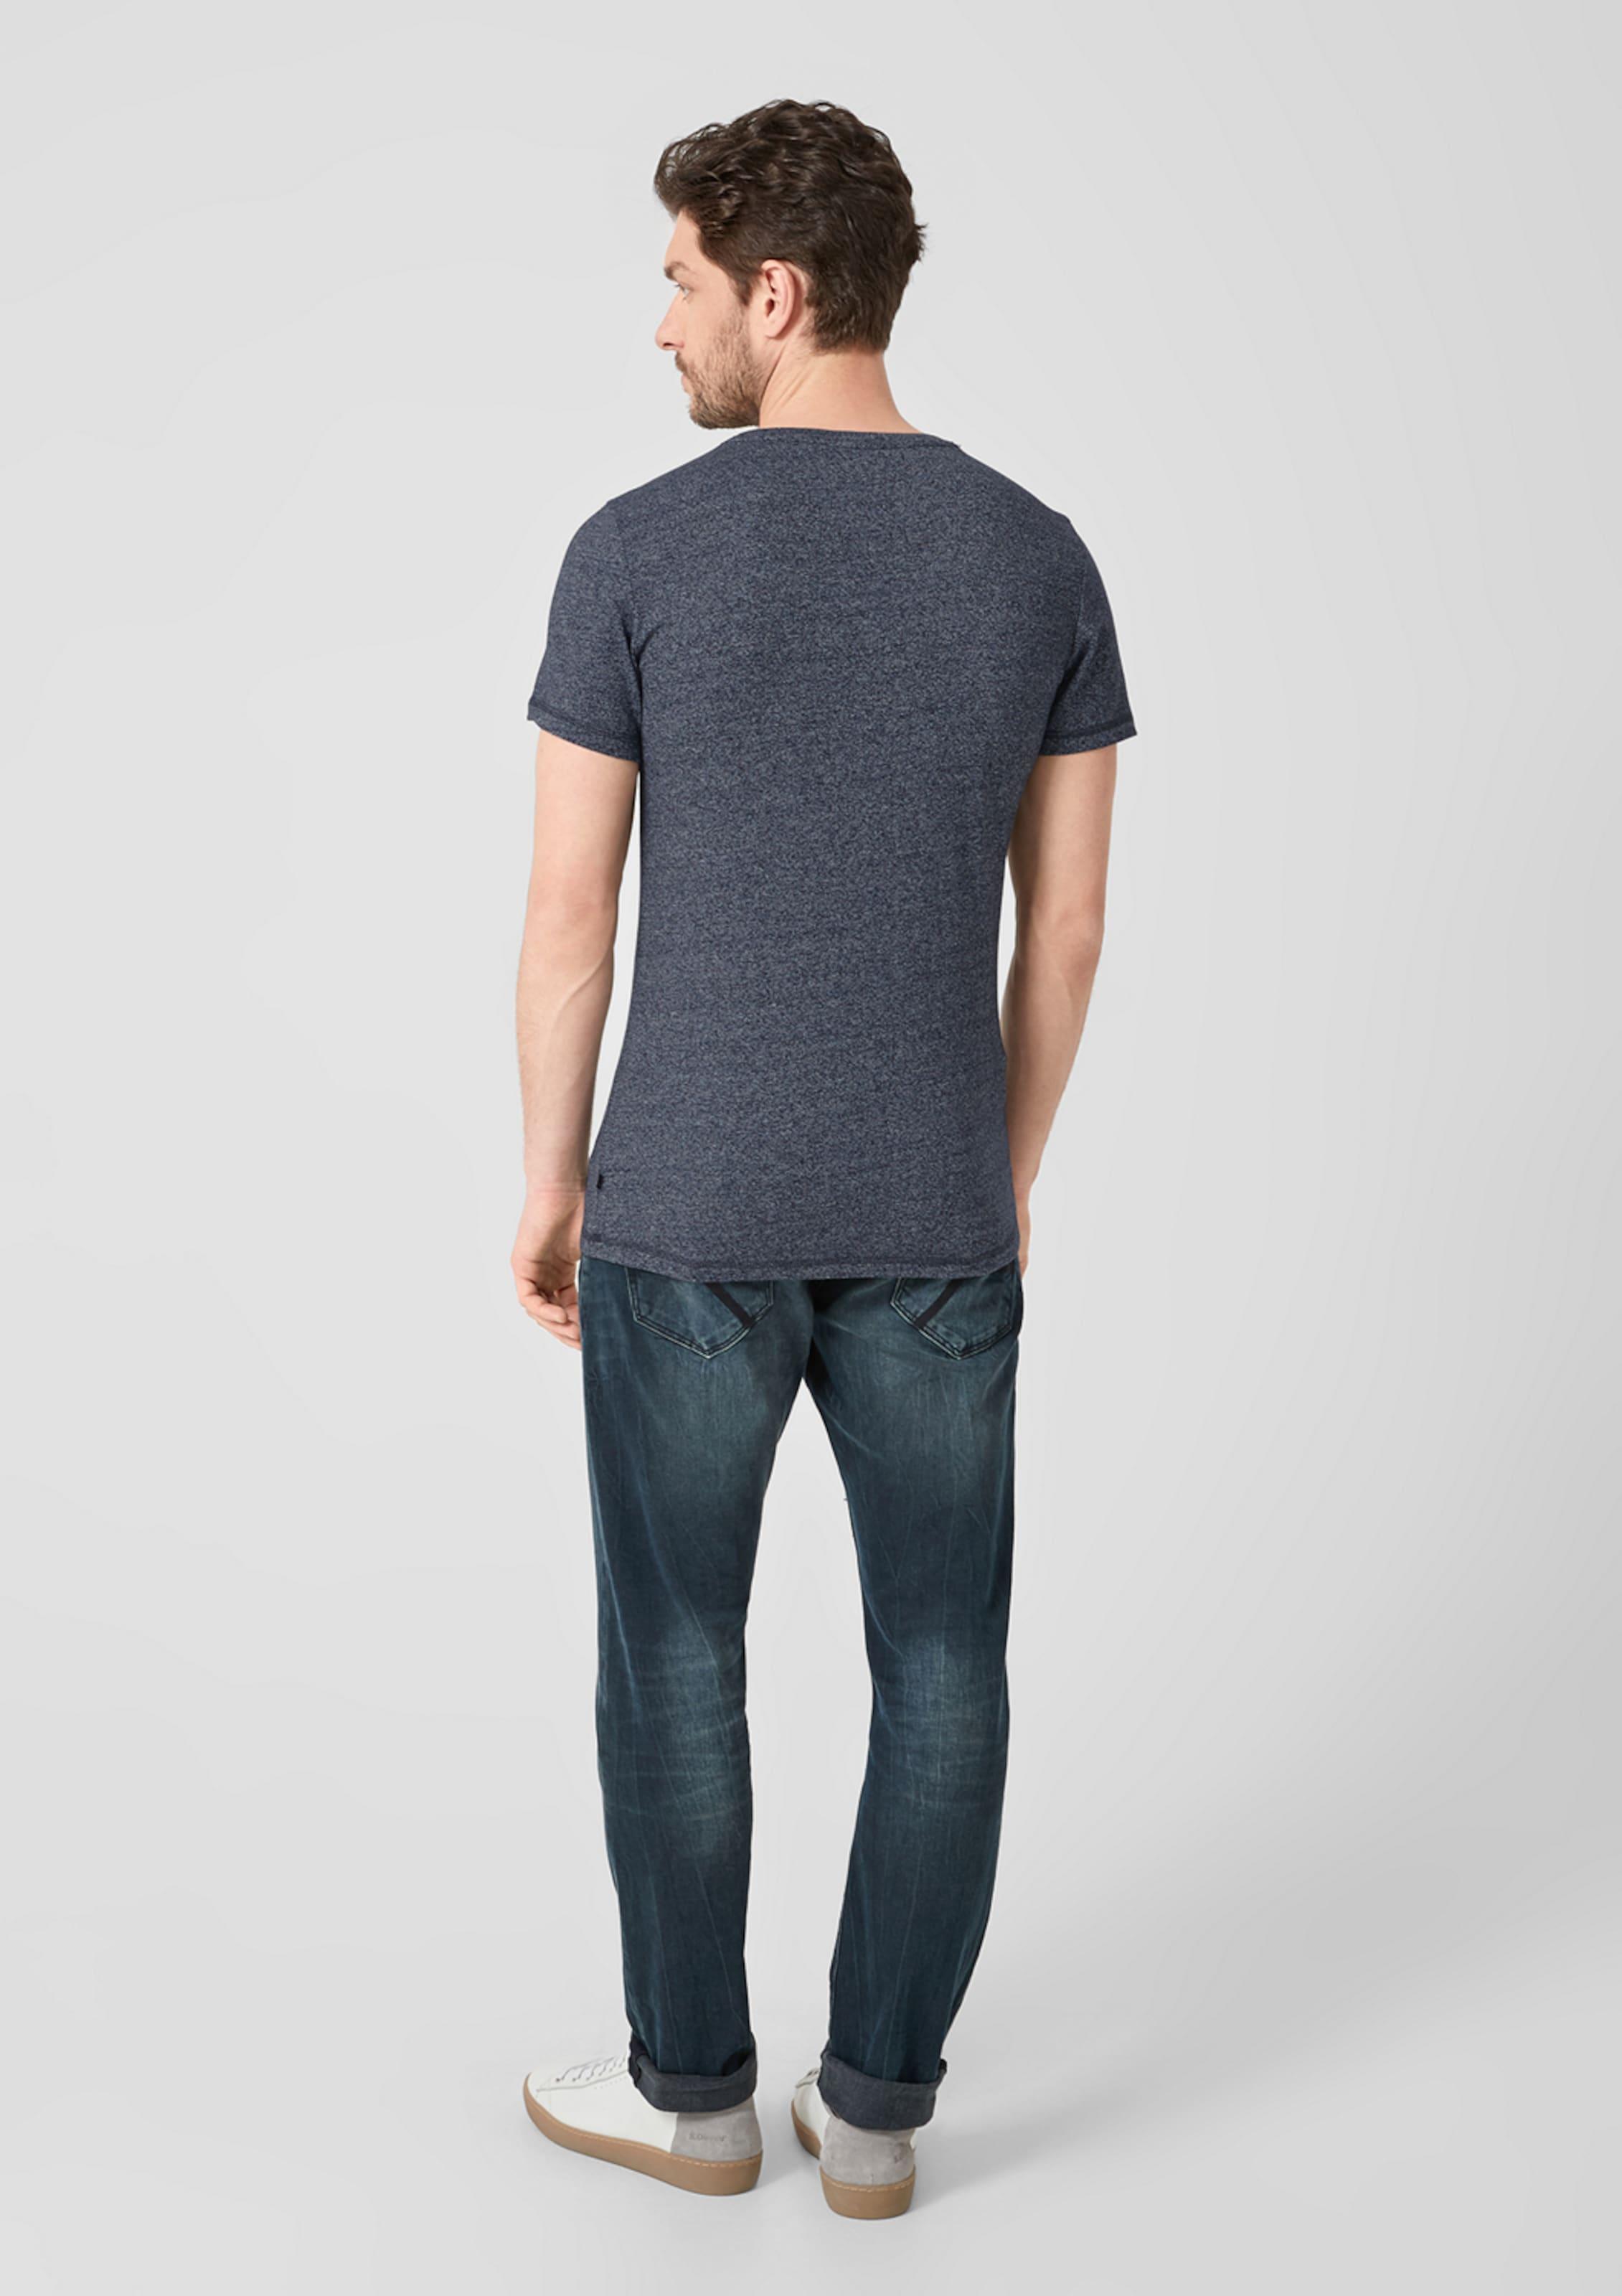 Q Designed By s Shirt Taubenblau In RL534Aj